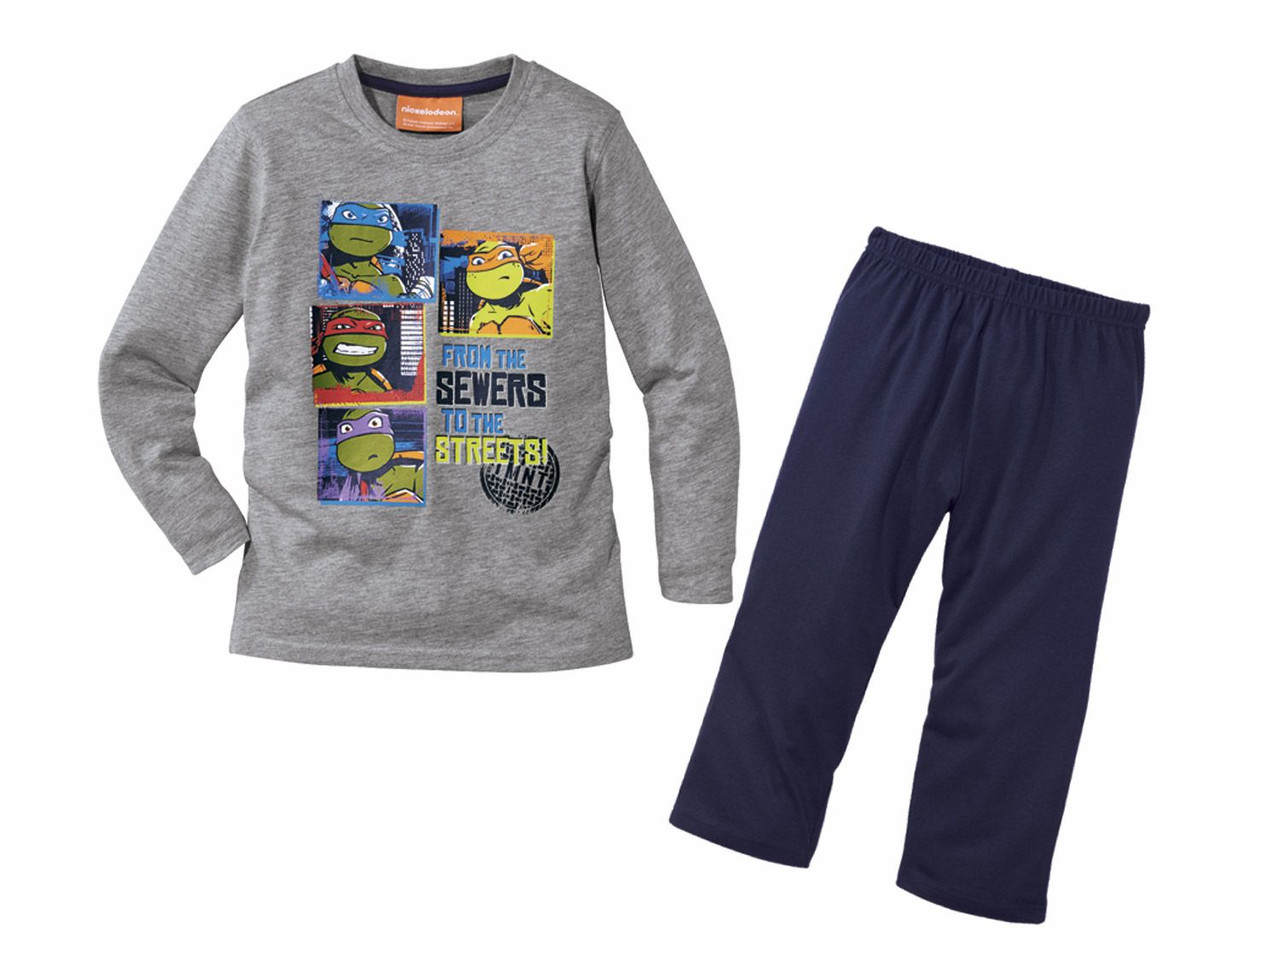 Пижама для мальчика.Ниндзя.Бельгия.